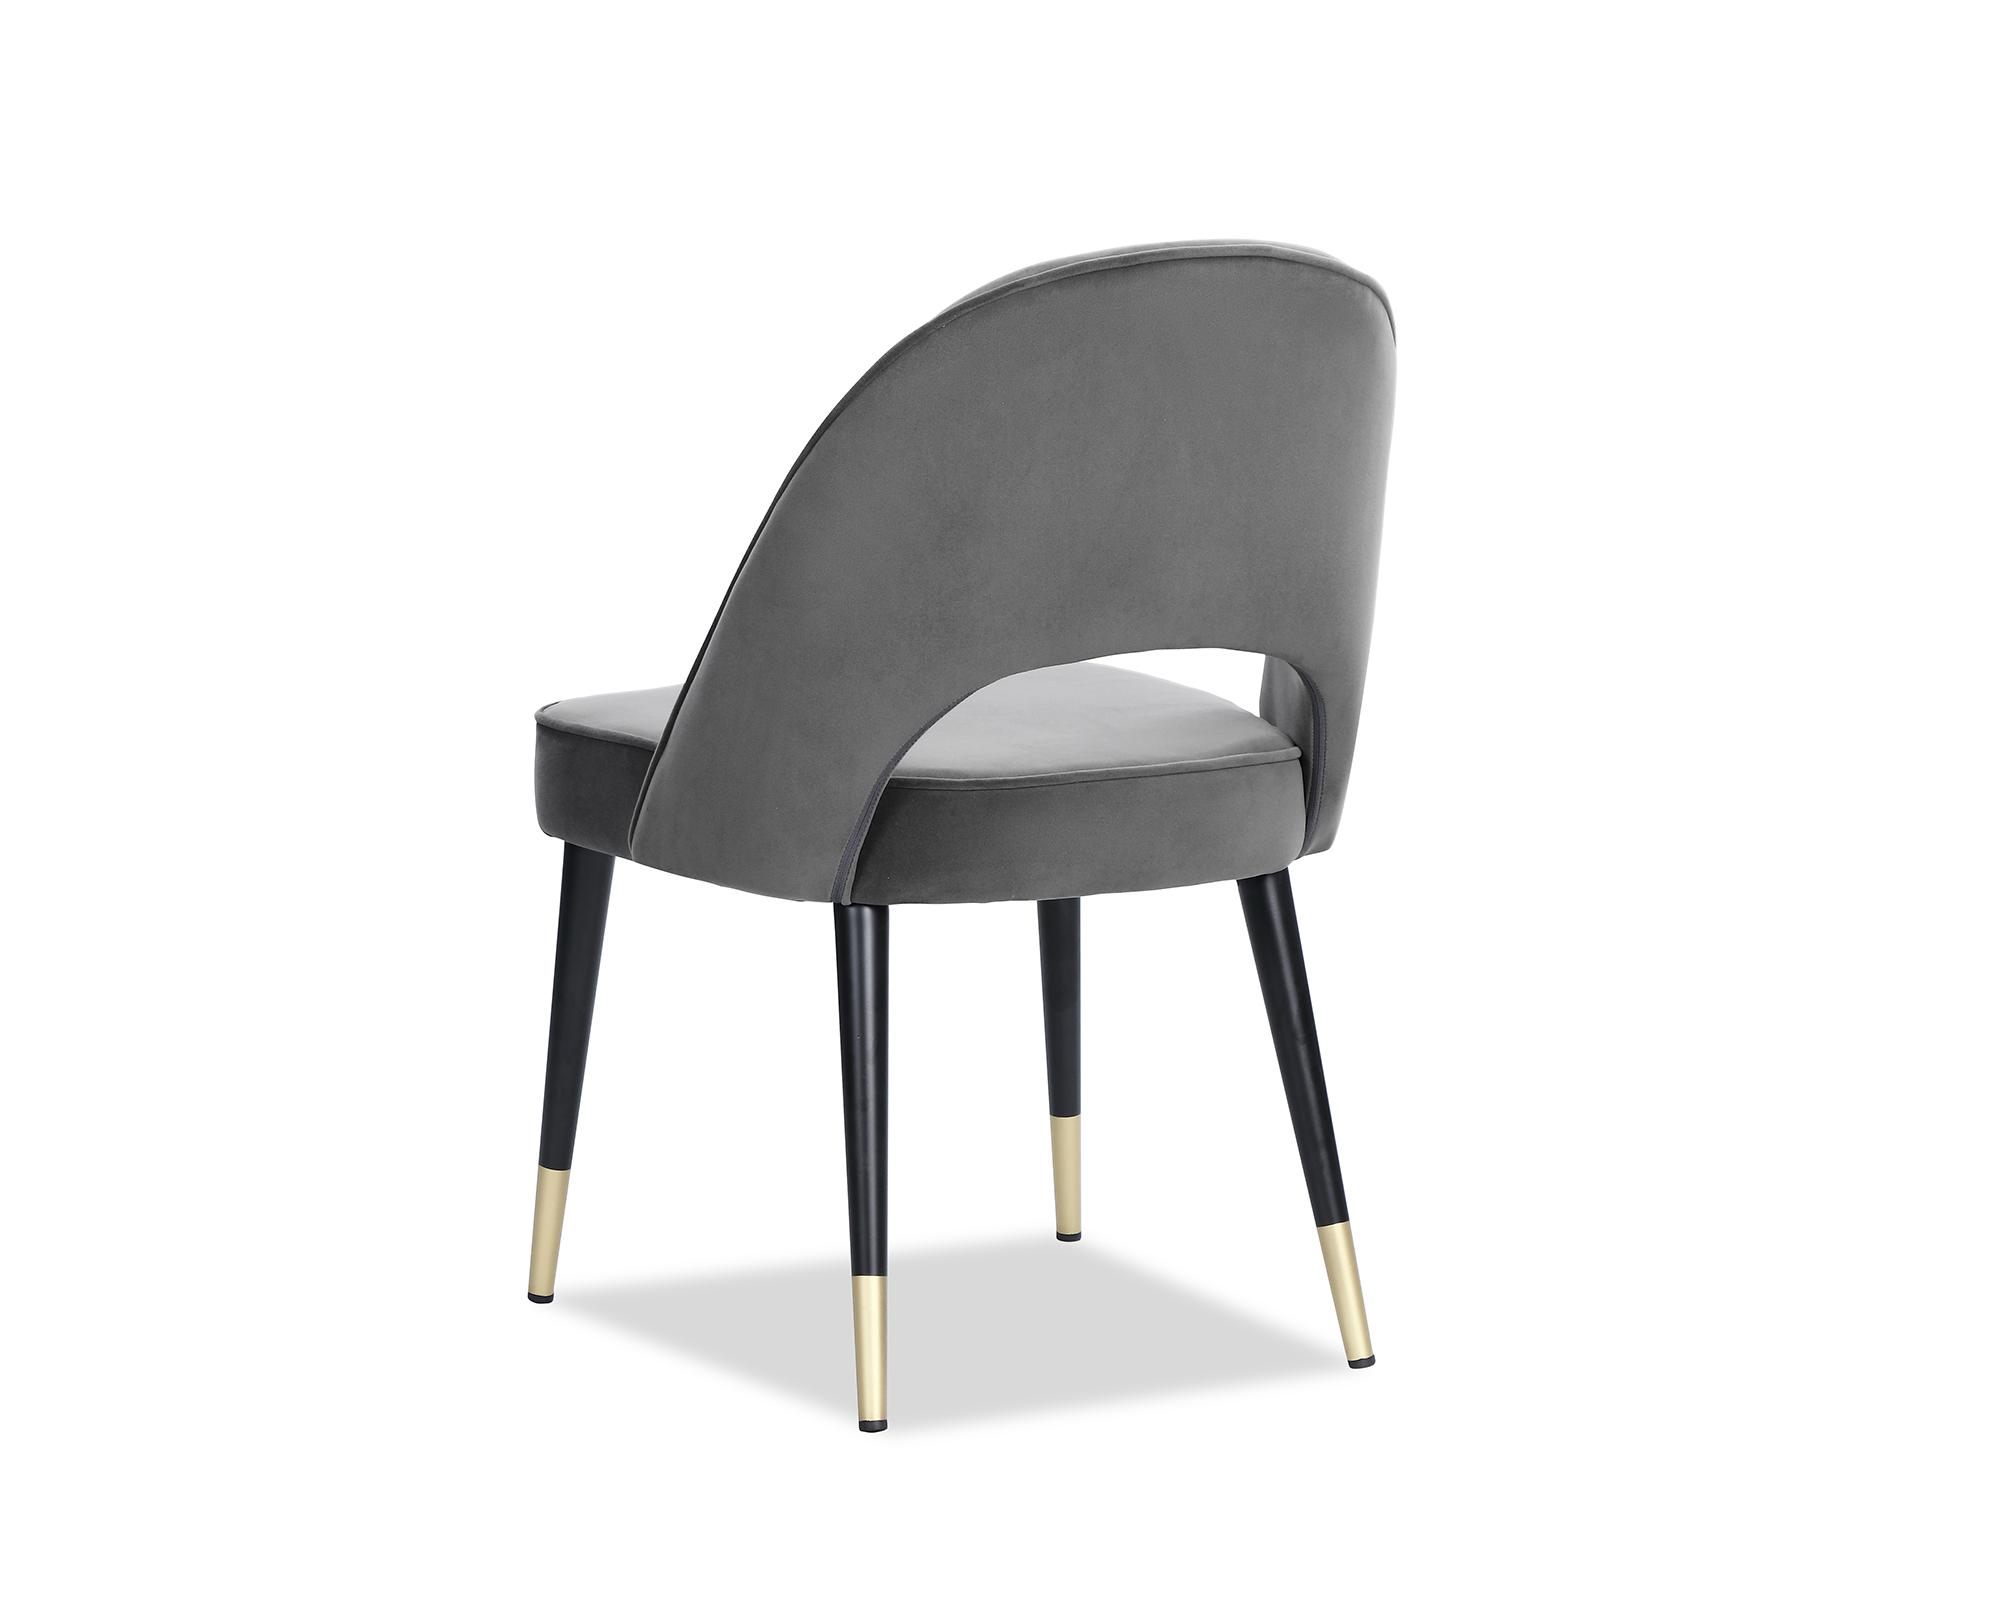 Liang & Eimil GV-DCH-007 Yvees Chair (1)